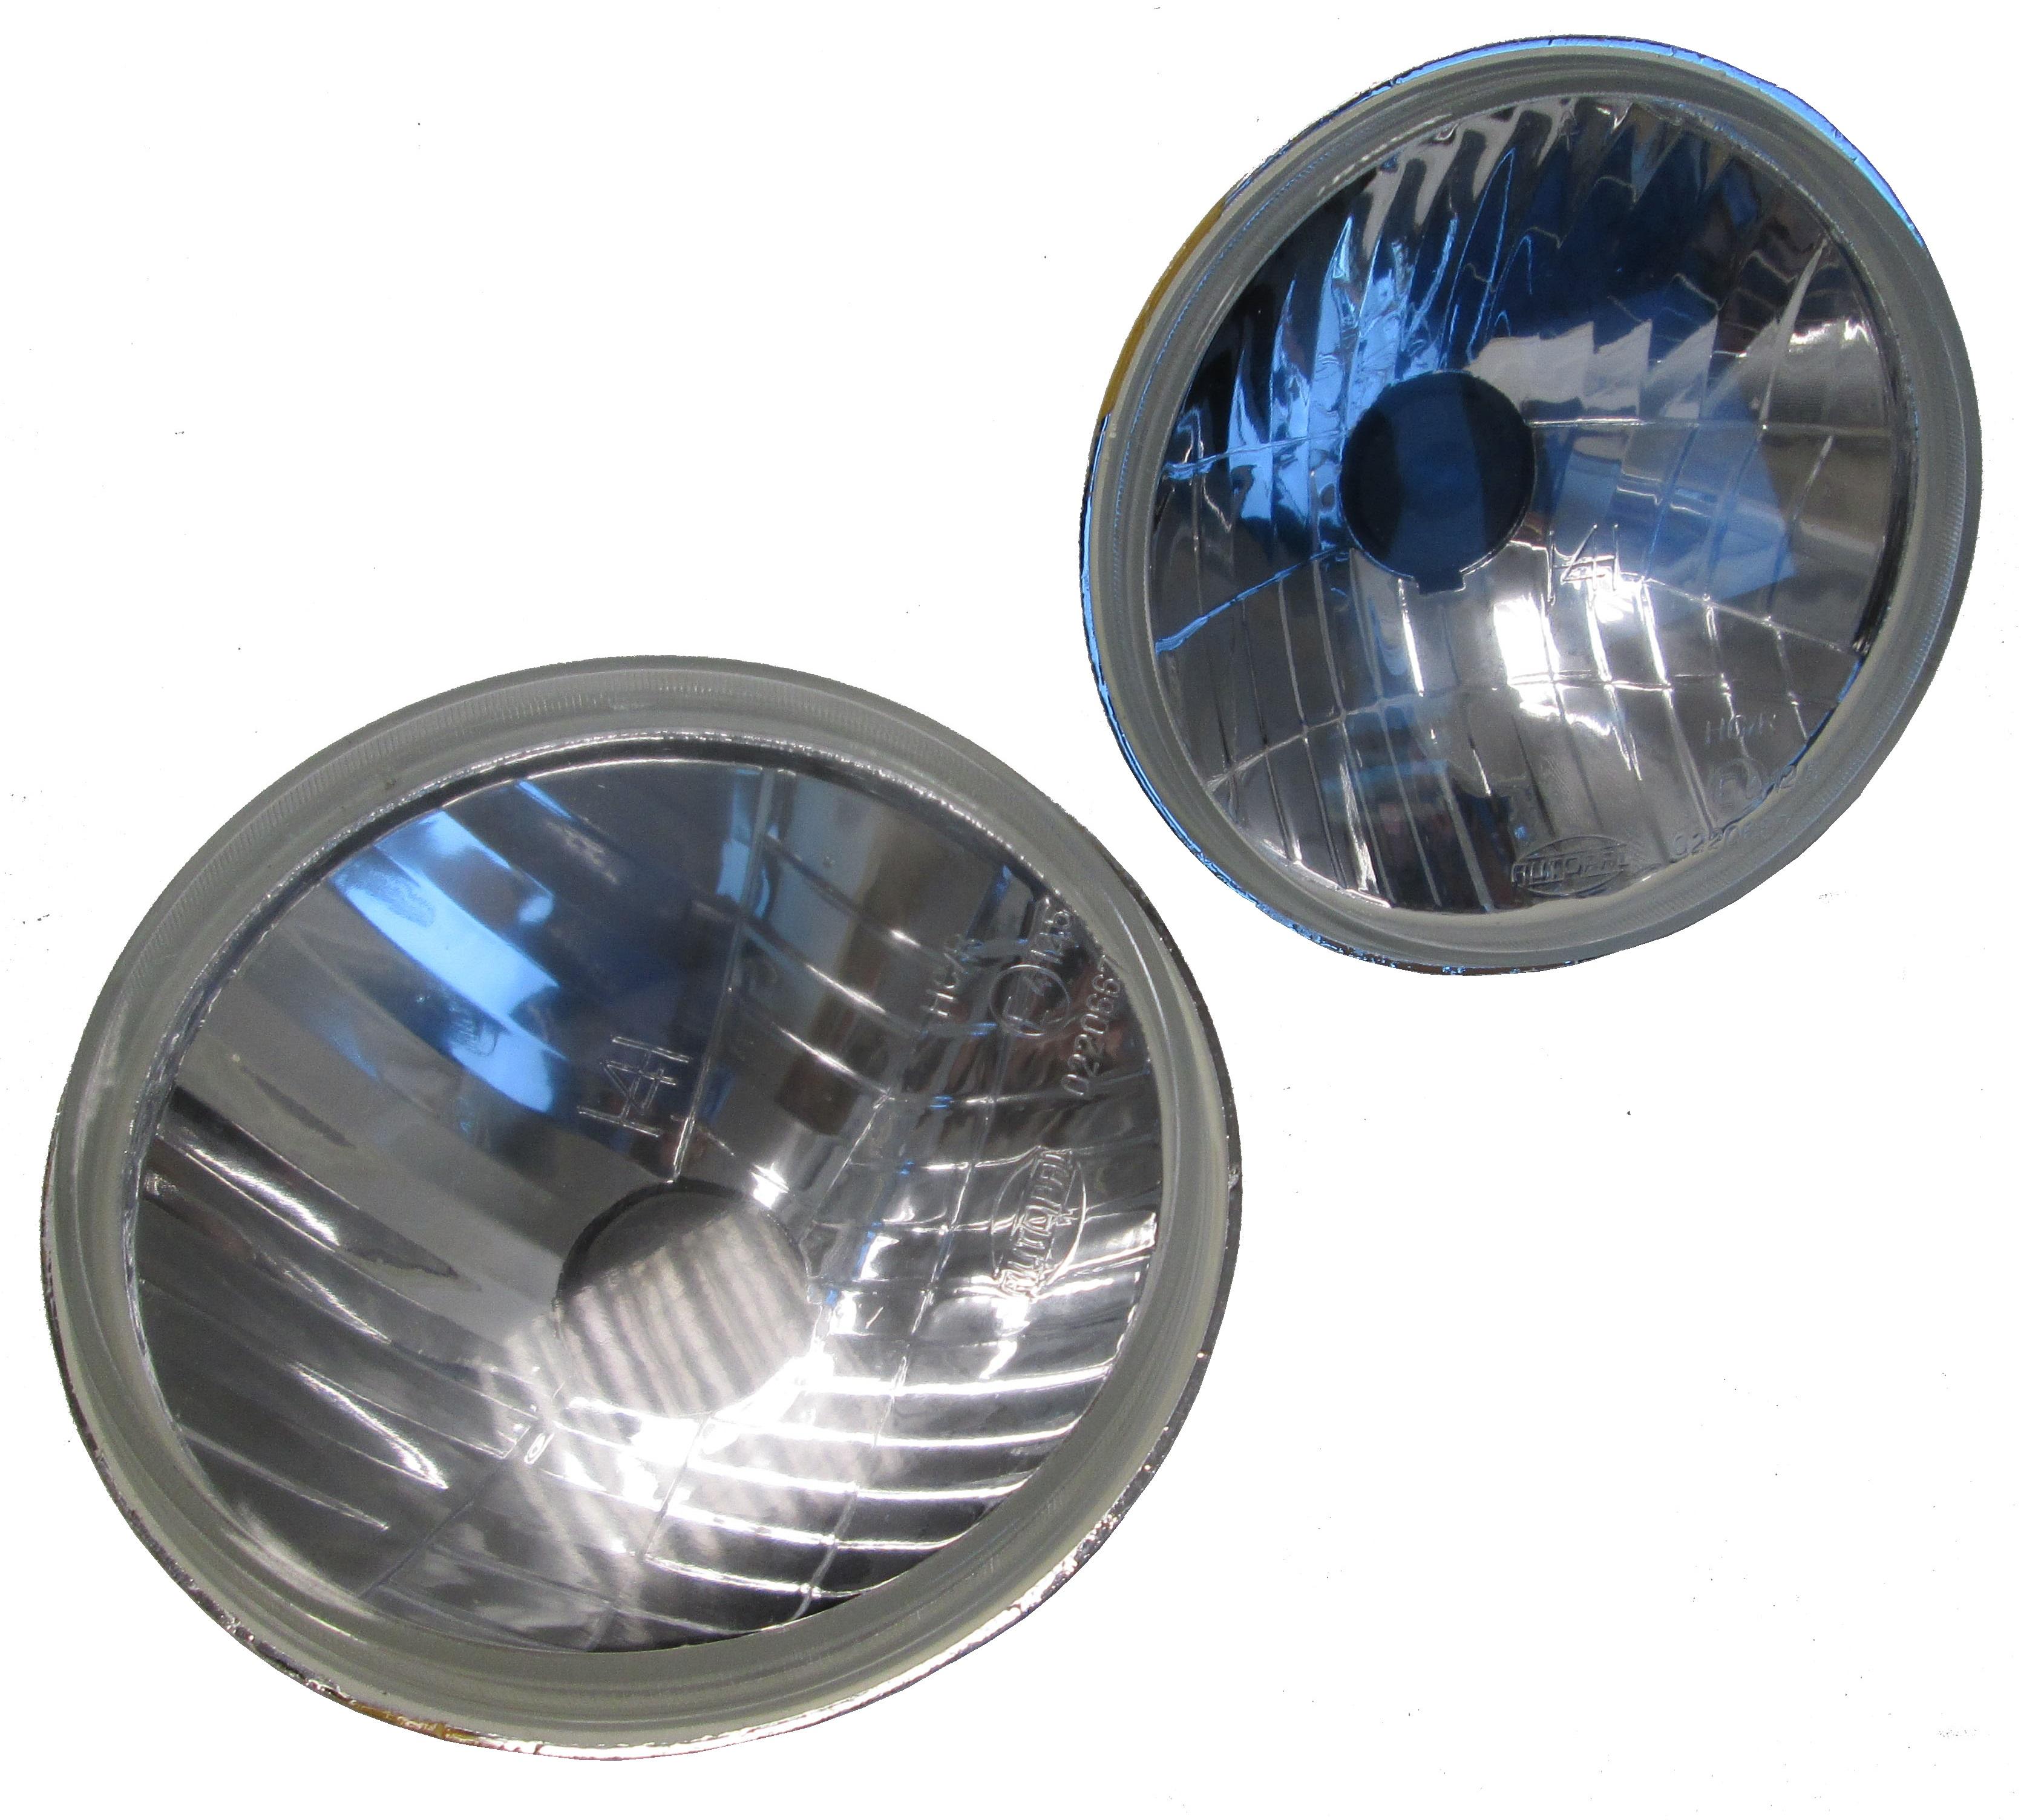 Crystal Halogen Headlight Upgrade Kit For Range Rover